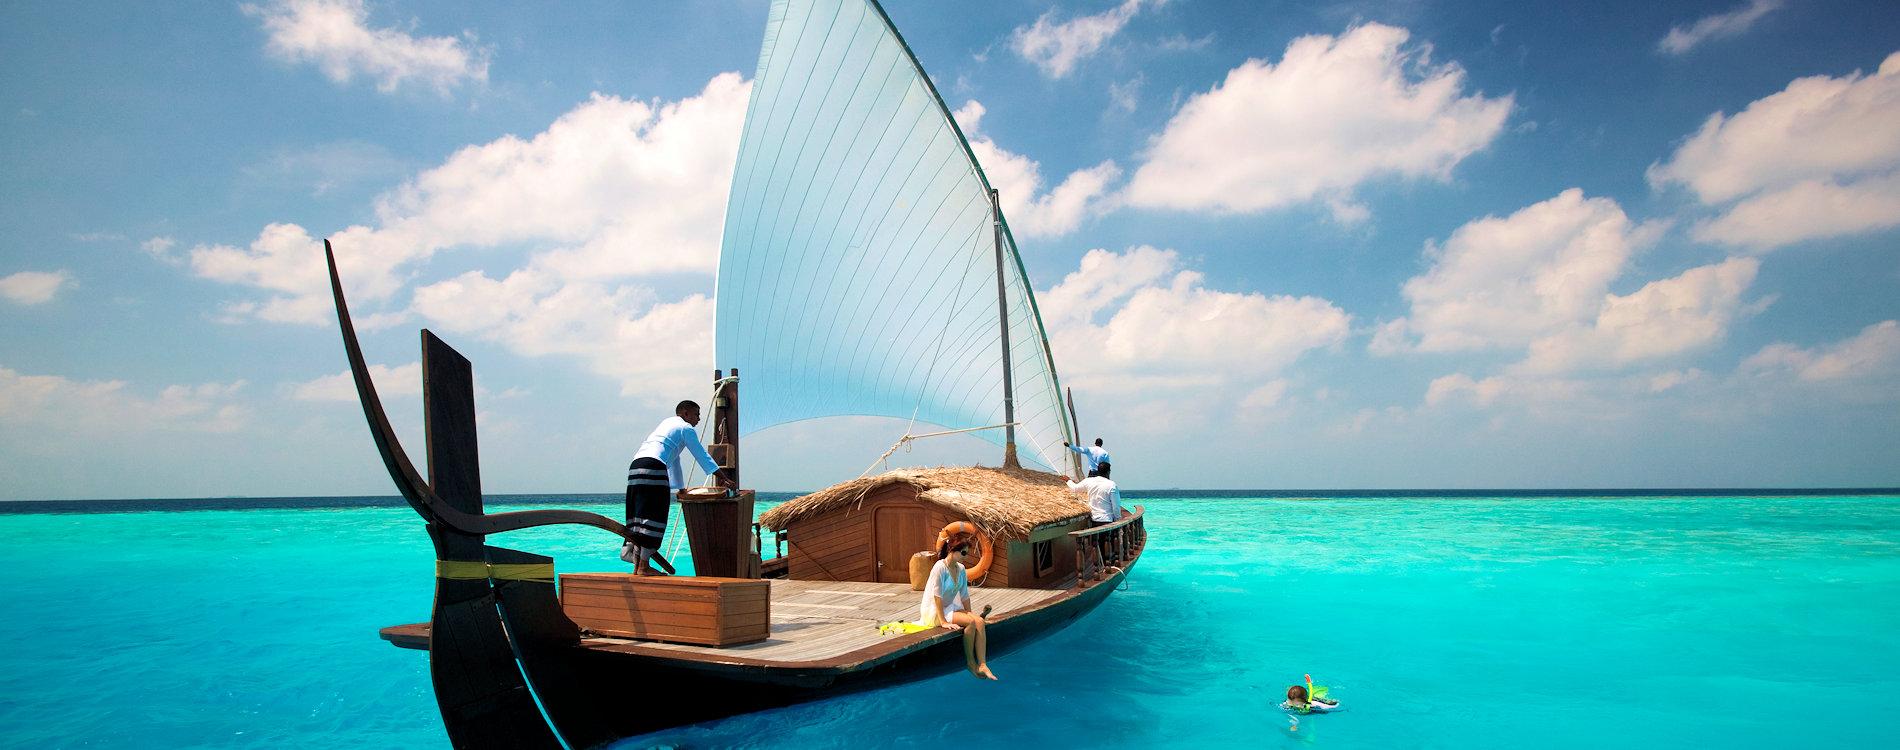 Couple on Nooma boat excursion at Baros Maldives